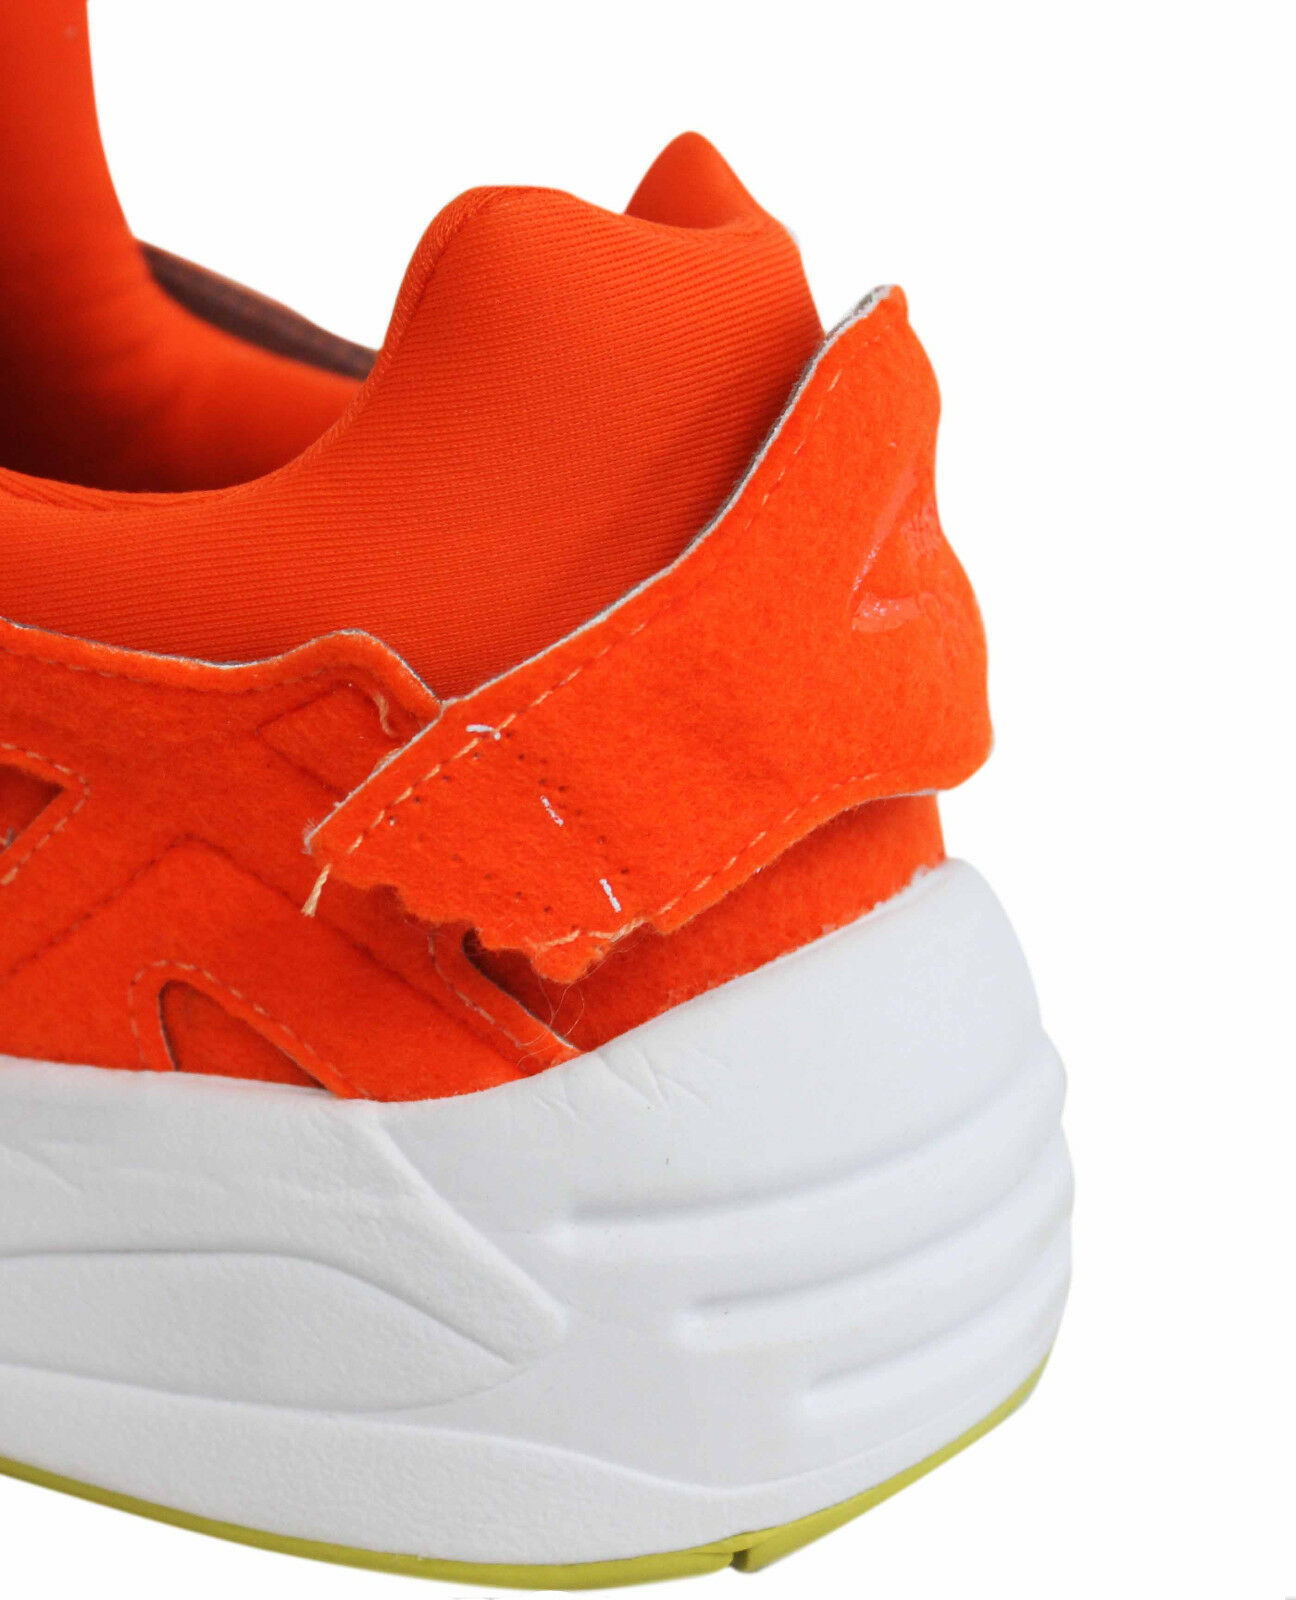 Puma Trinomic Disc Blaze Orange Orange Orange Felt Uomo Trainers Slip On Shoes 359361 01 P2 a203fb